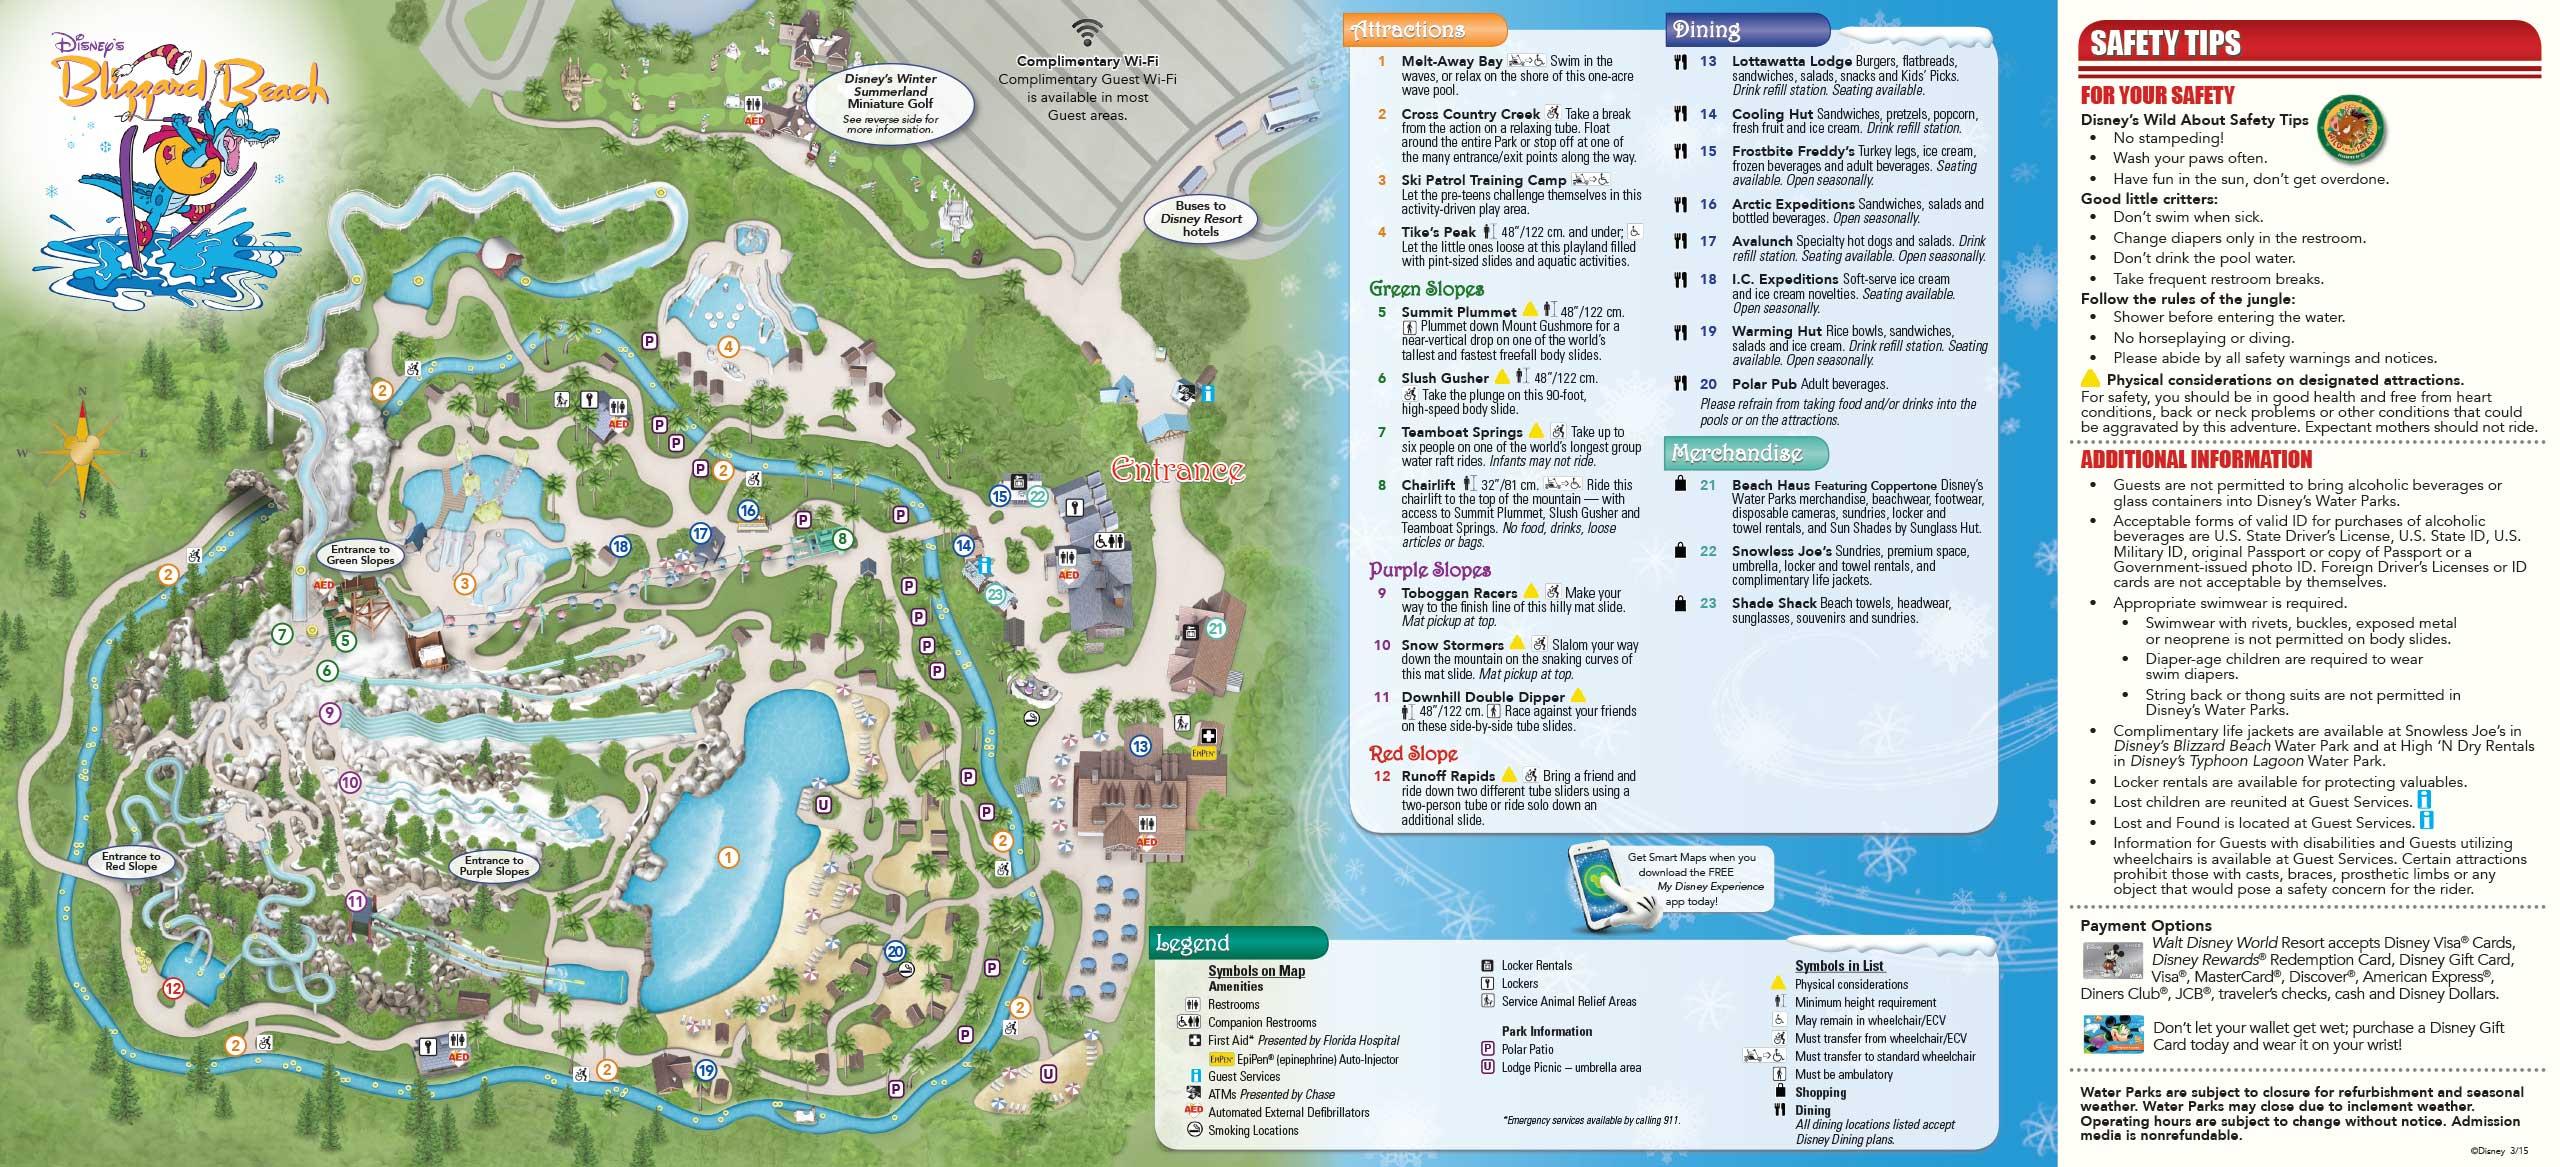 May 2015 Walt Disney World Resort Park Maps